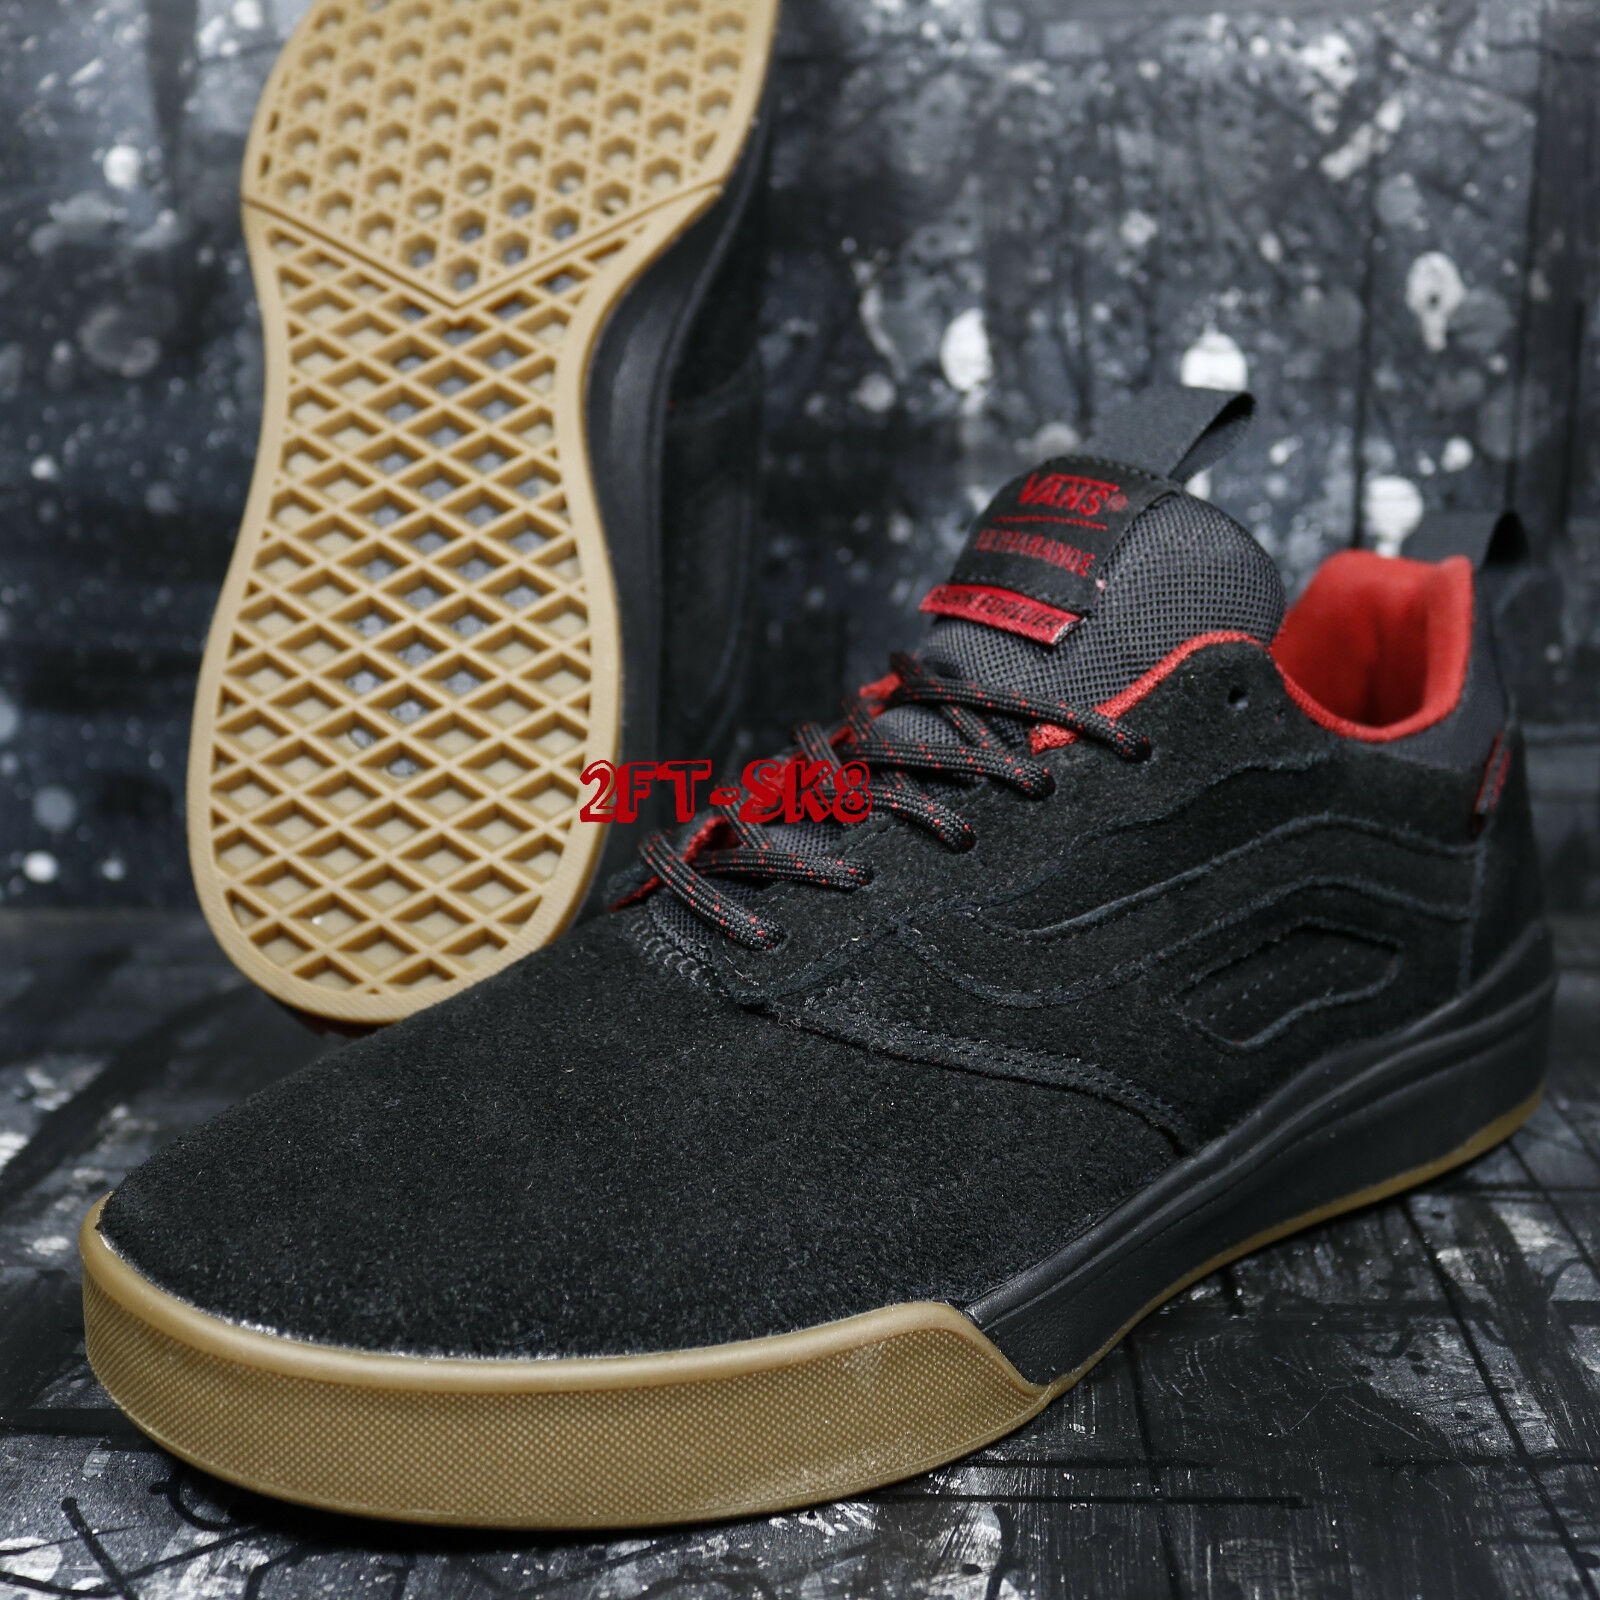 VANS ULTRARANGE PRO SPITFIRE Herren CARDIEL BLACK SUEDE  Herren SPITFIRE SKATE Schuhe/ S89247.129 7e1274